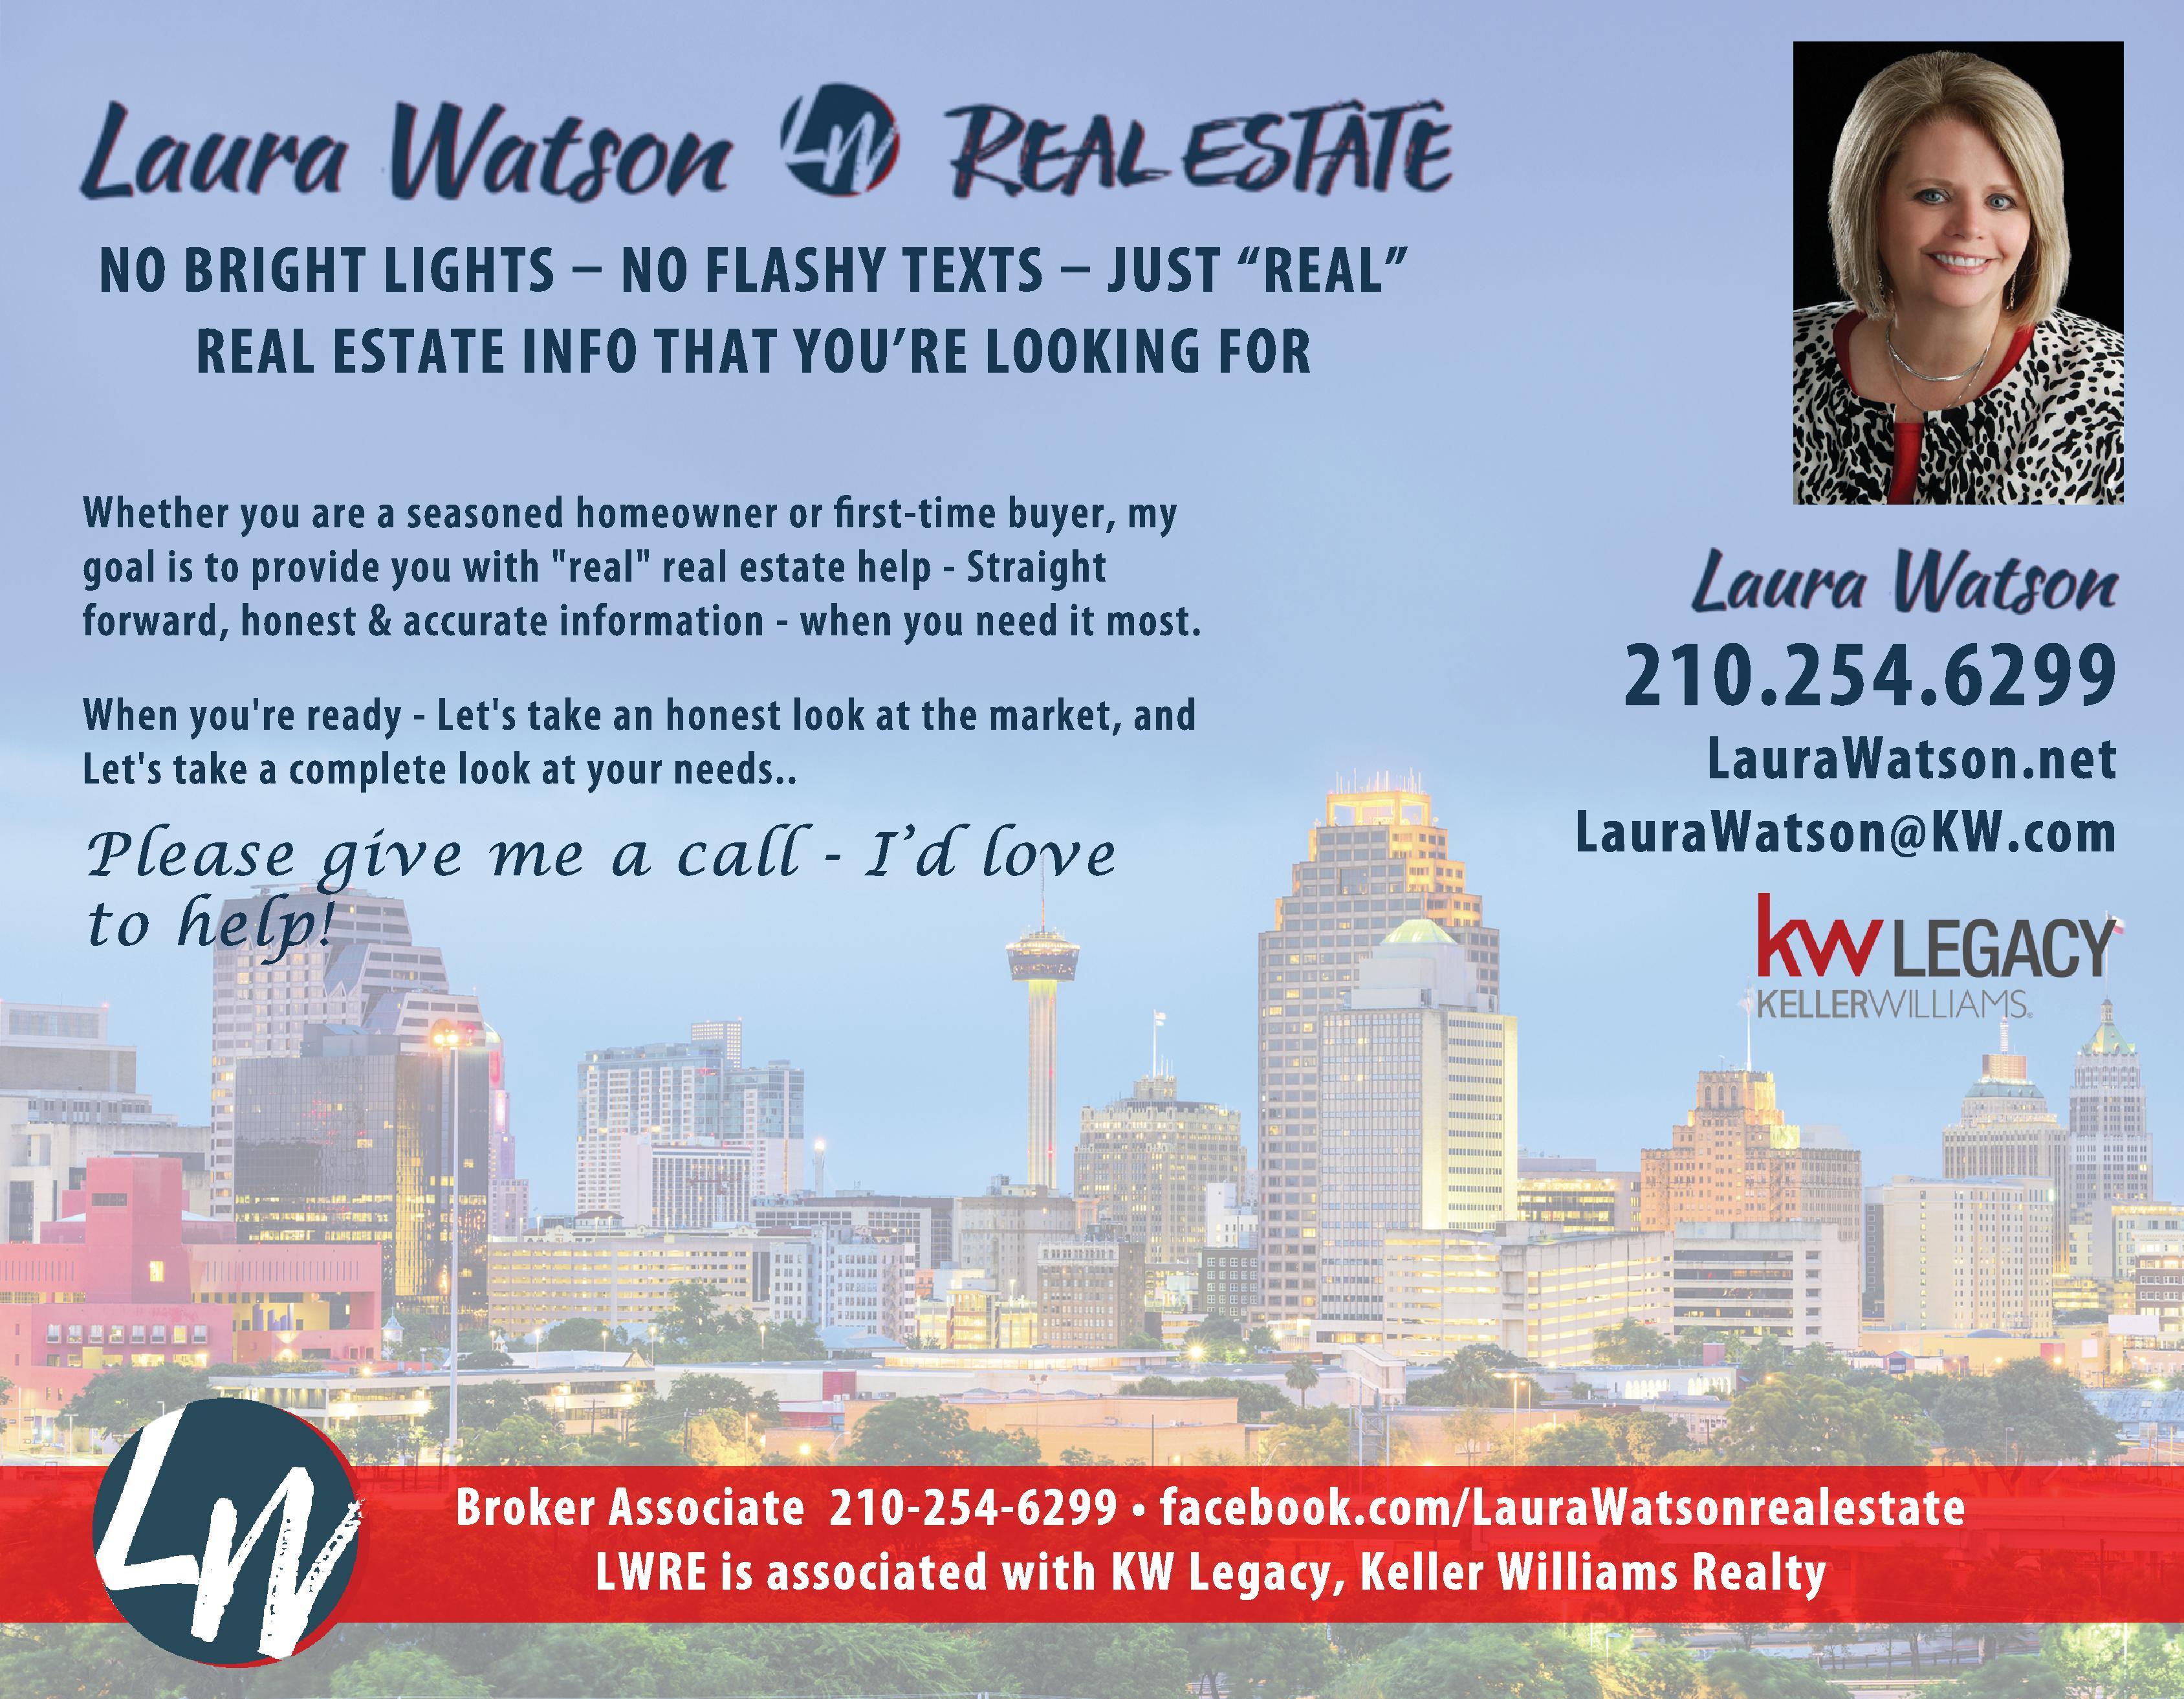 Laura Watson Real Estate - Keller Williams Legacy